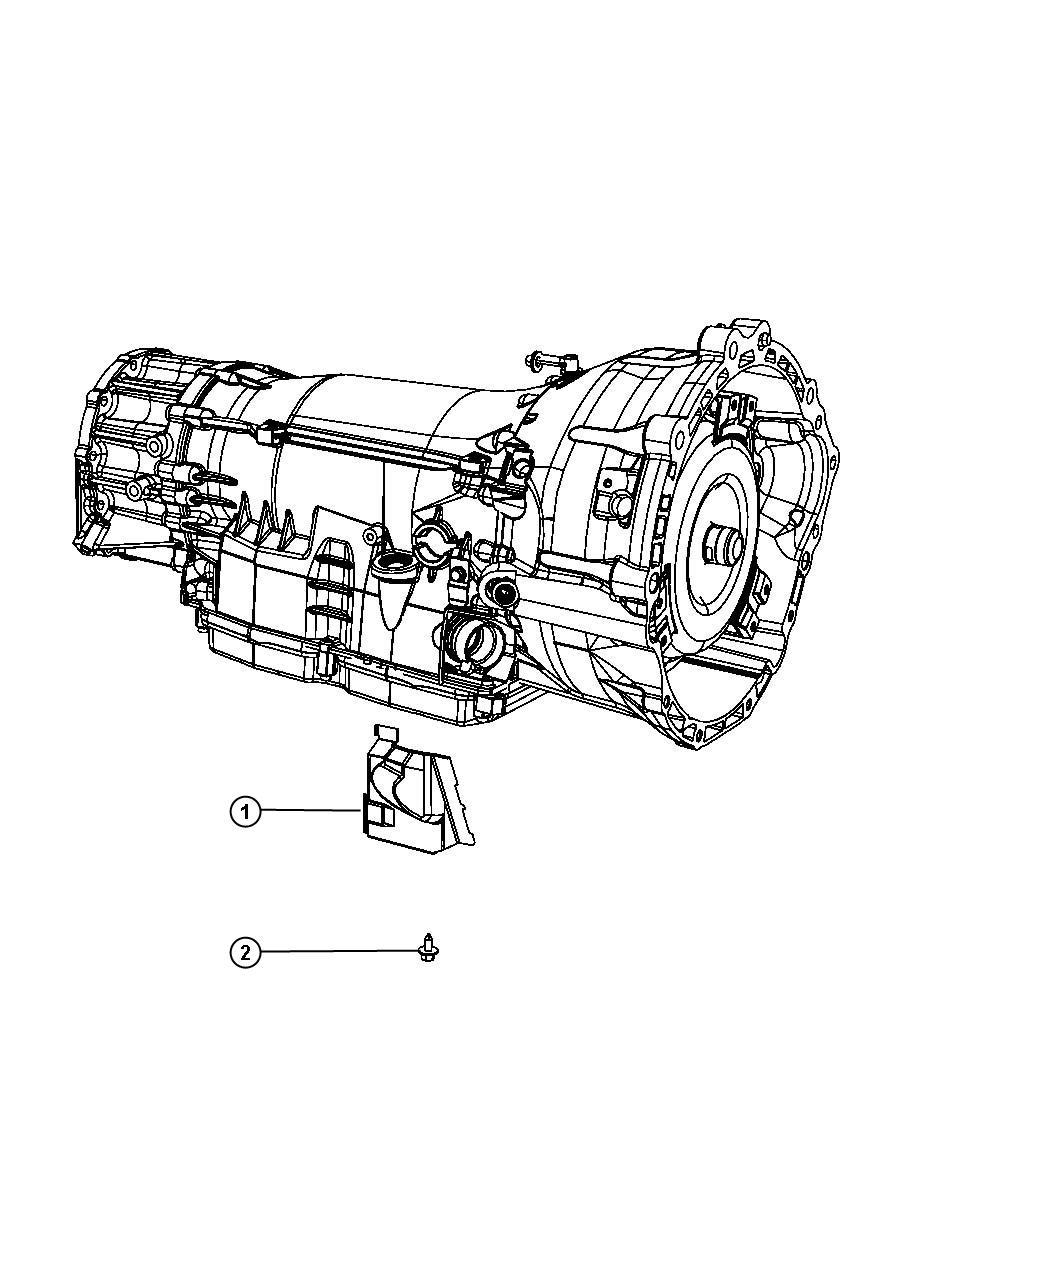 Chrysler Concorde Screw  Hex Head  M6x1x15  Mounting